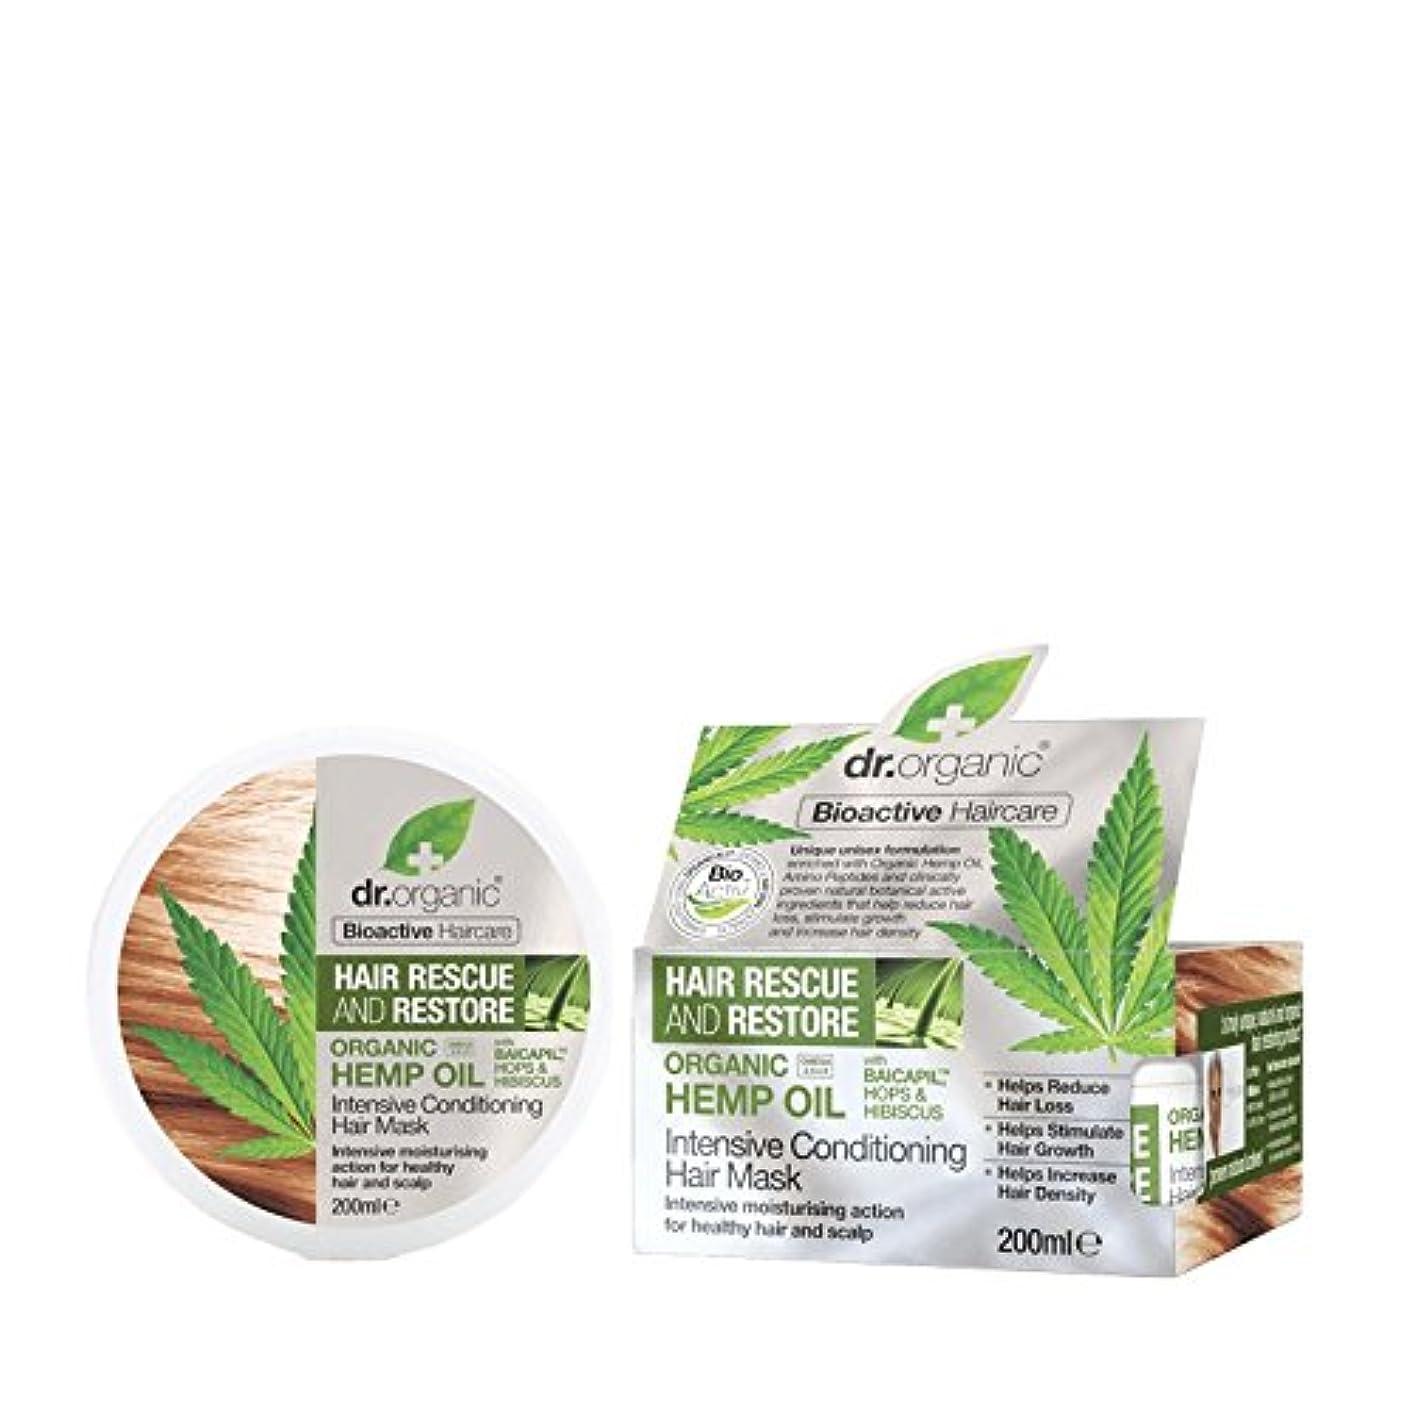 Dr有機大麻油の集中コンディショナー200ミリリットル - Dr Organic Hemp Oil Intensive Conditioner 200ml (Dr Organic) [並行輸入品]